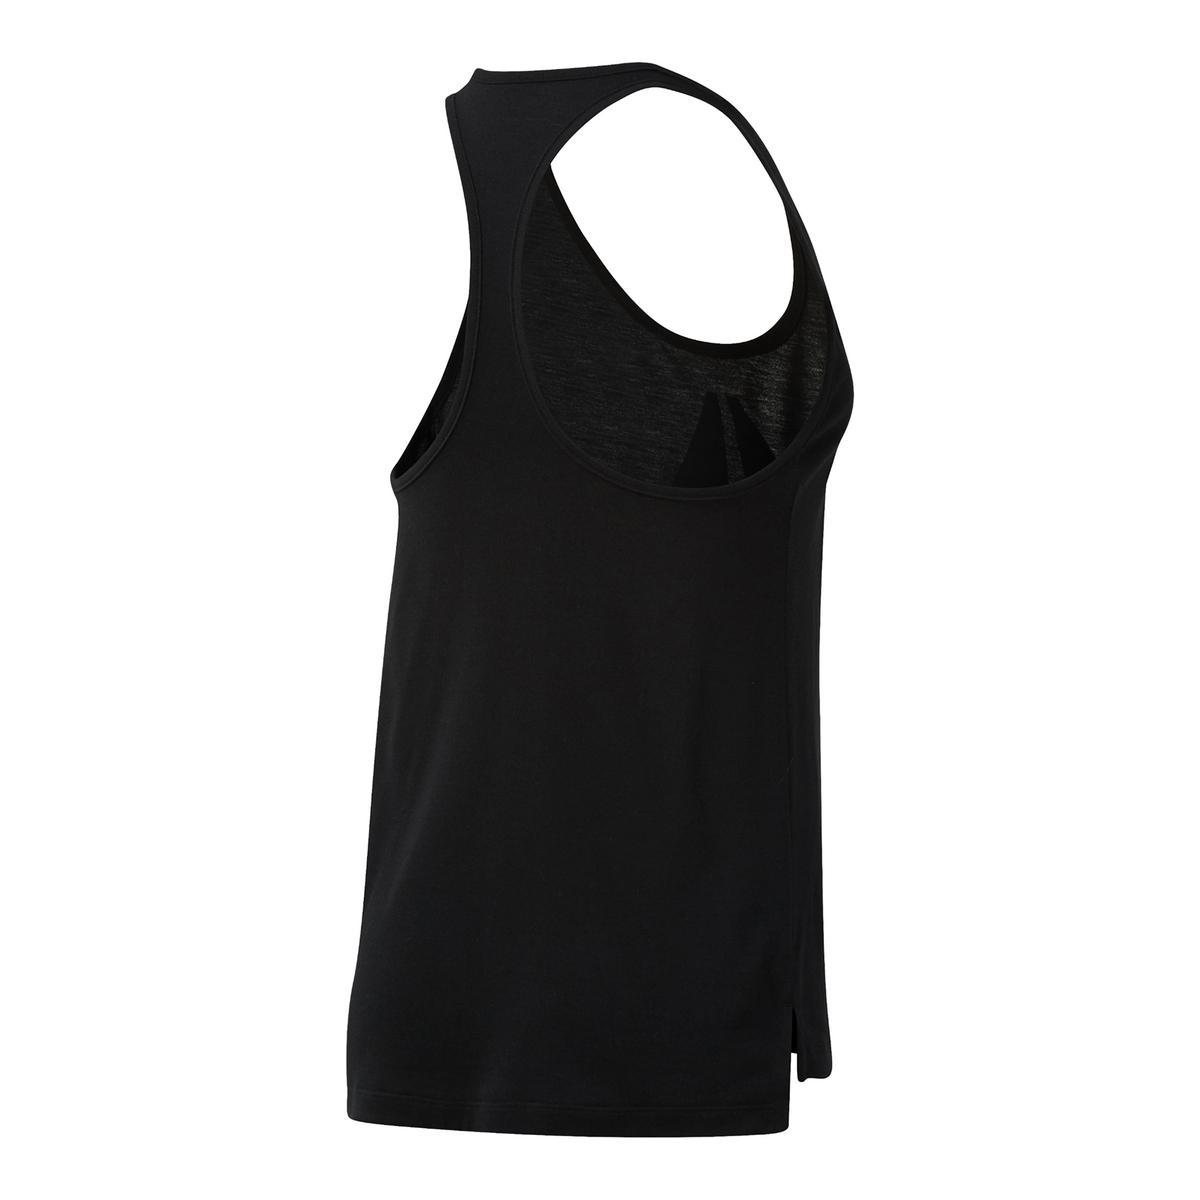 Imagen secundaria de producto de Camiseta de tirantes finos, Wor Supremium - Reebok